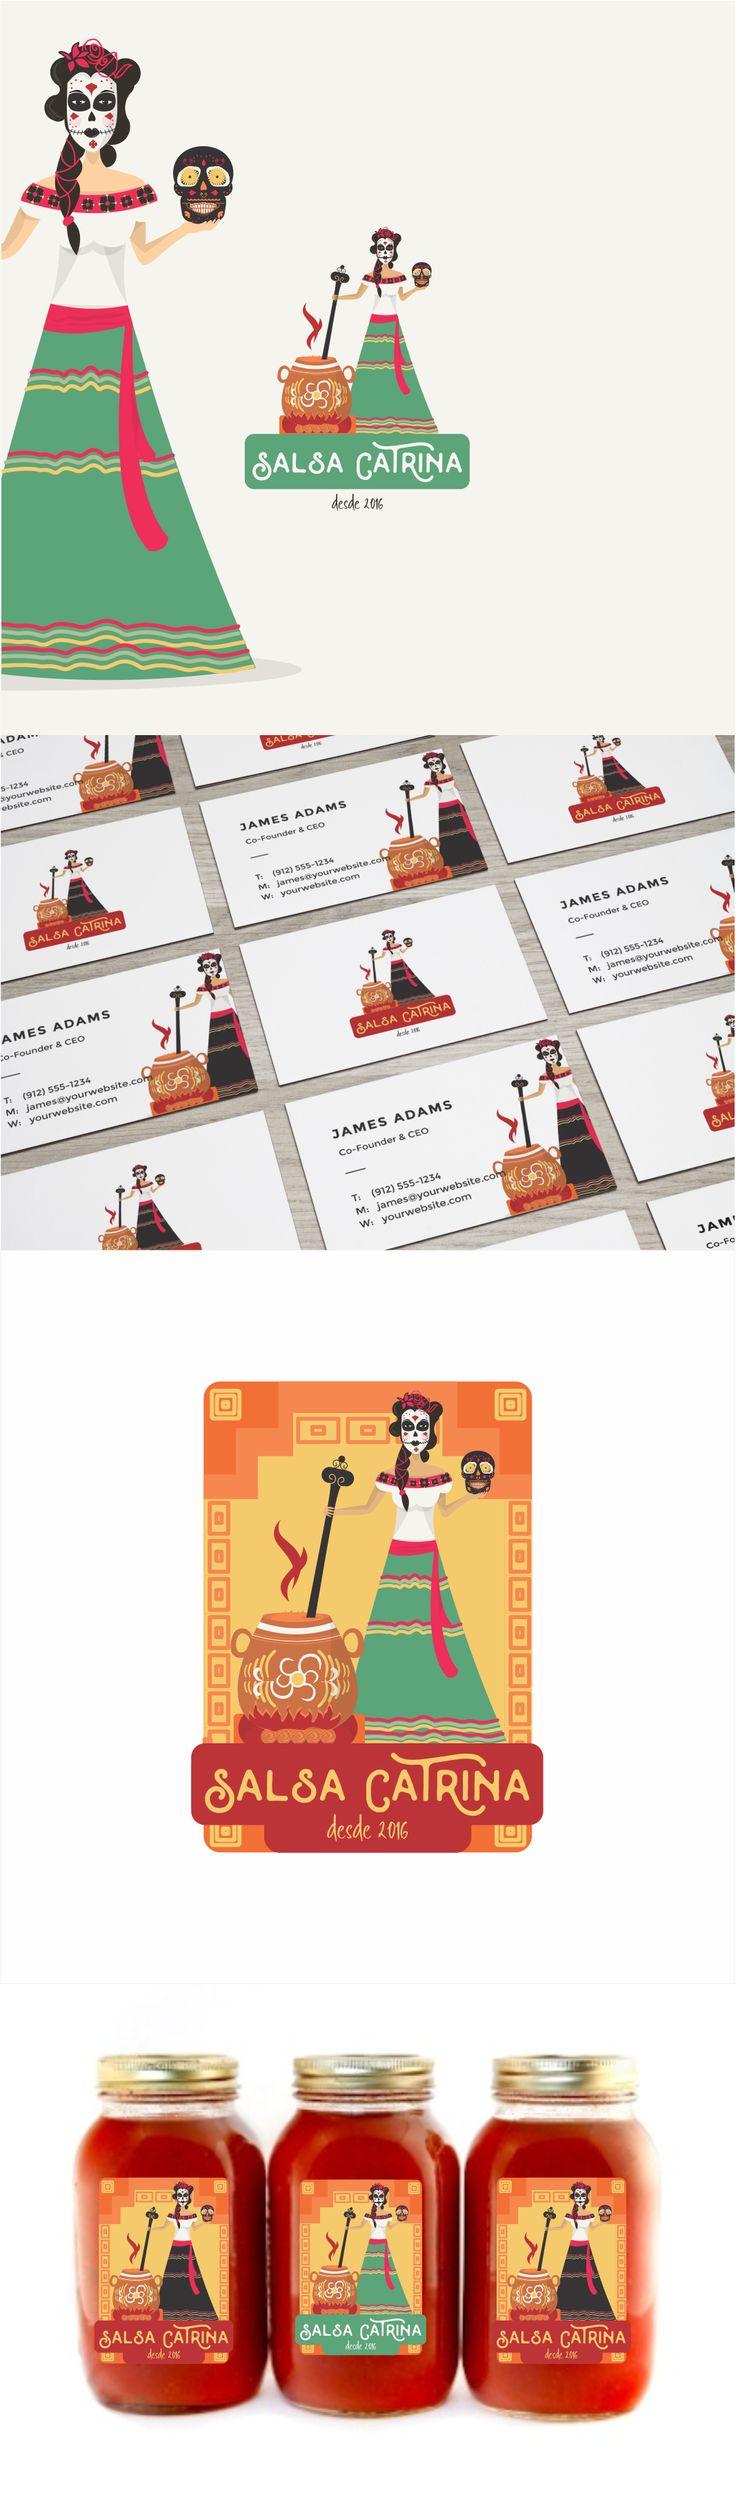 23 best restaurant logo design and branding ideas images on